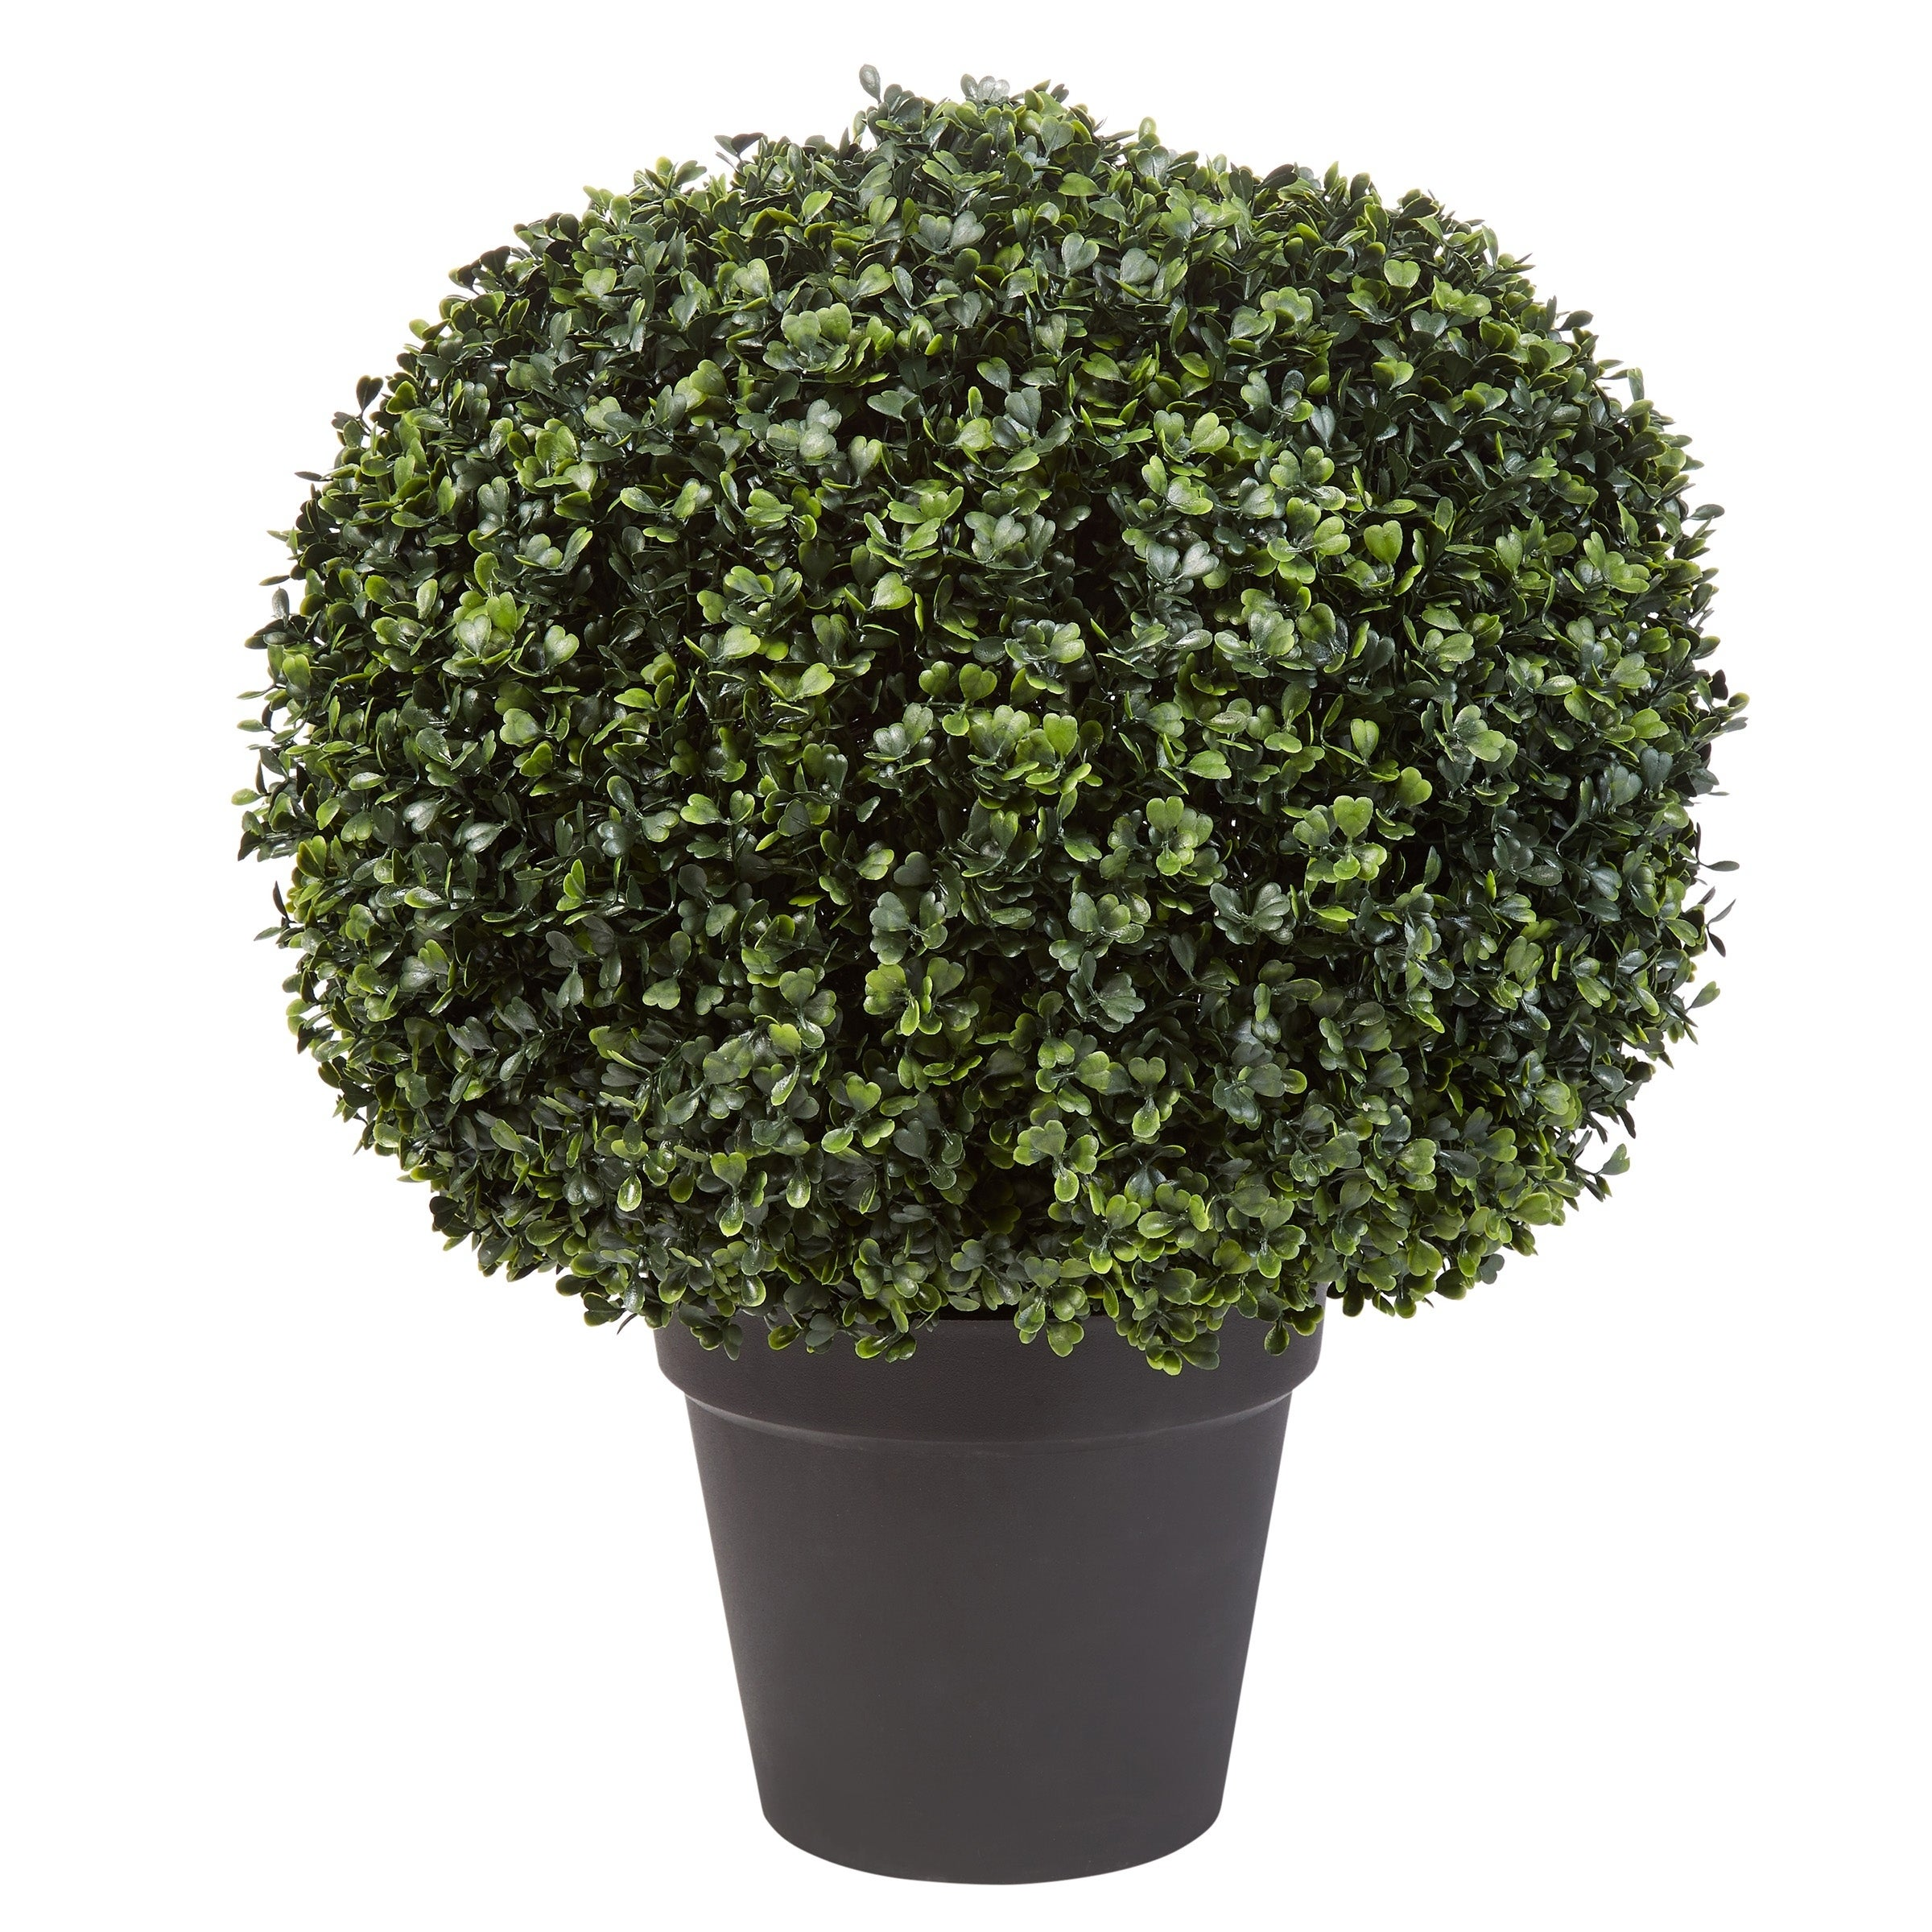 Realistic Look Green Decorative Artificial Home Garden Outdoor Plant Tree Pot